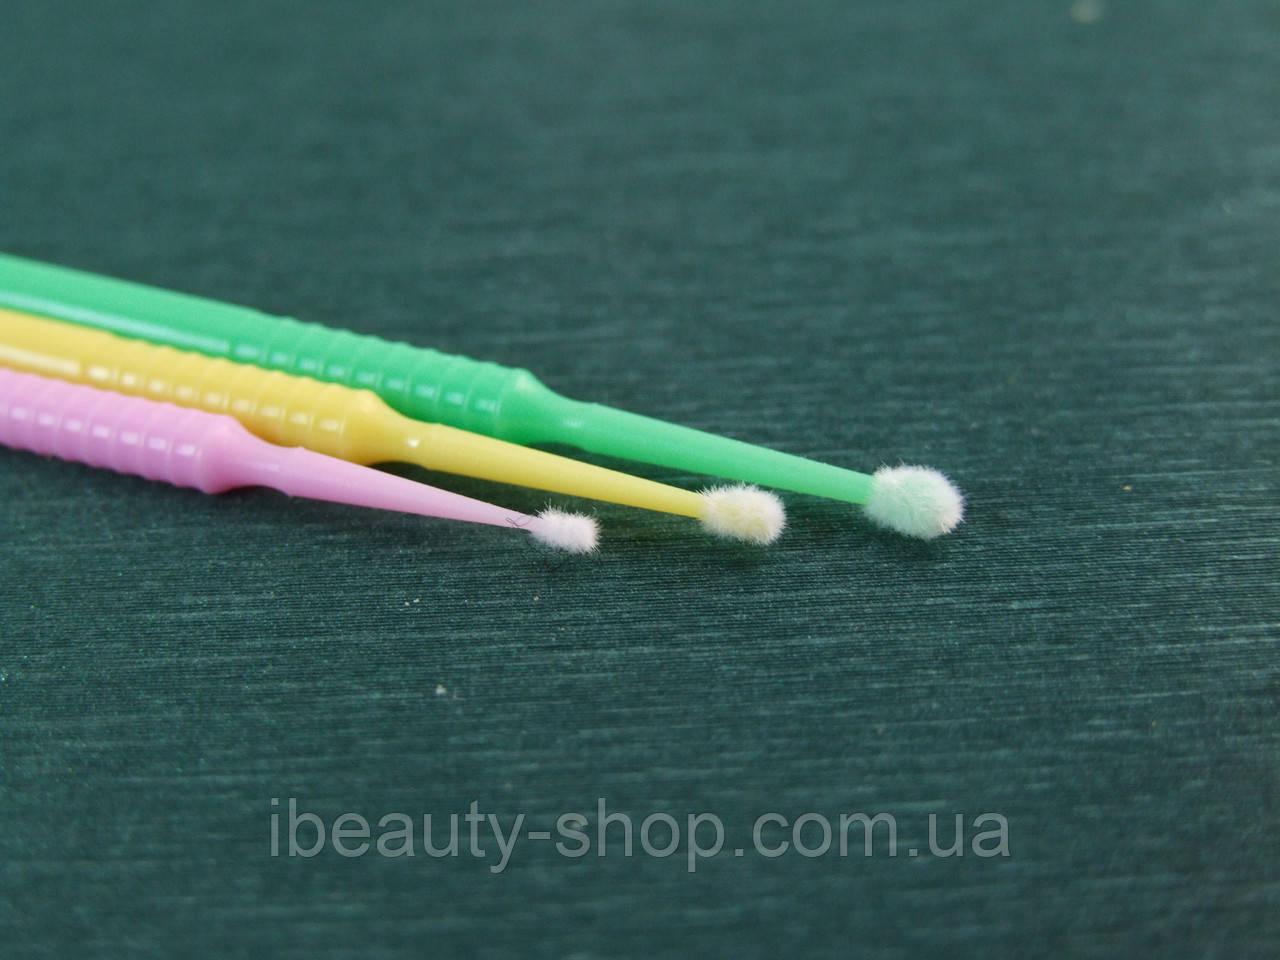 Микробраши,1 шт, 2,5 мм, мягкая упаковка.